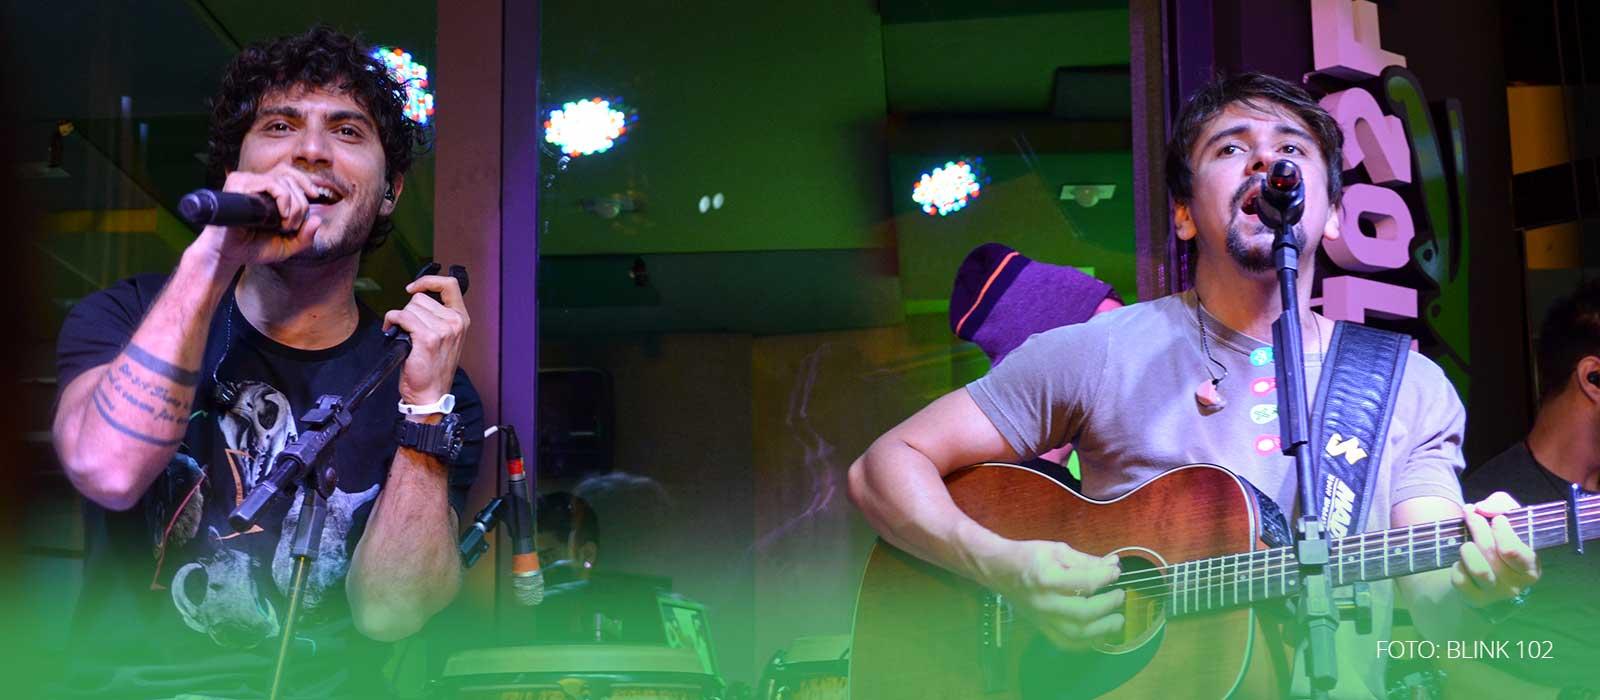 Bruninho e Davi na Blink 102